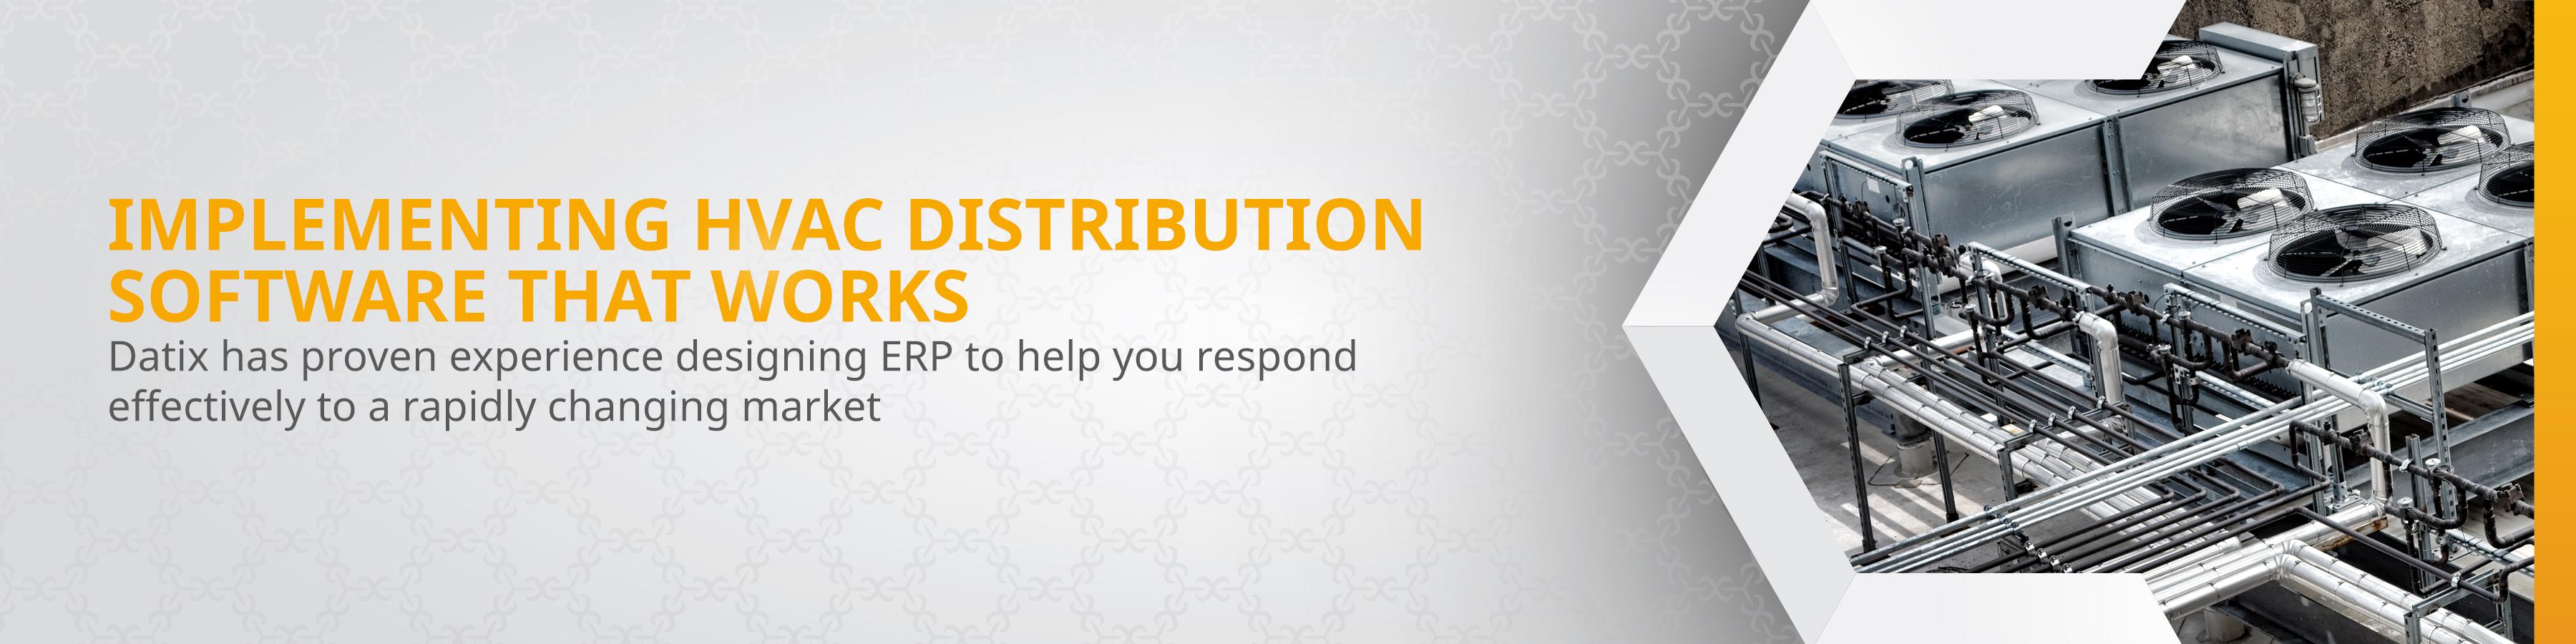 HVAC Distribution Software